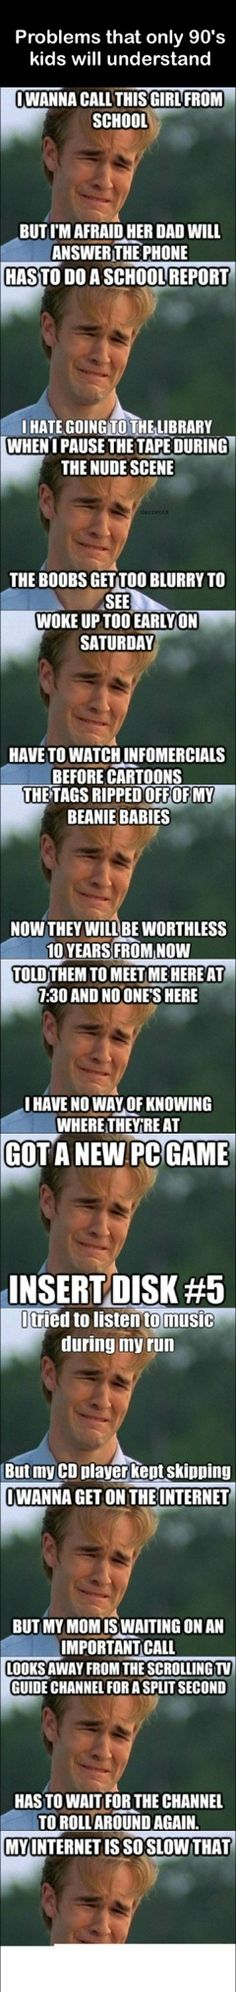 Only 90s kids will understand